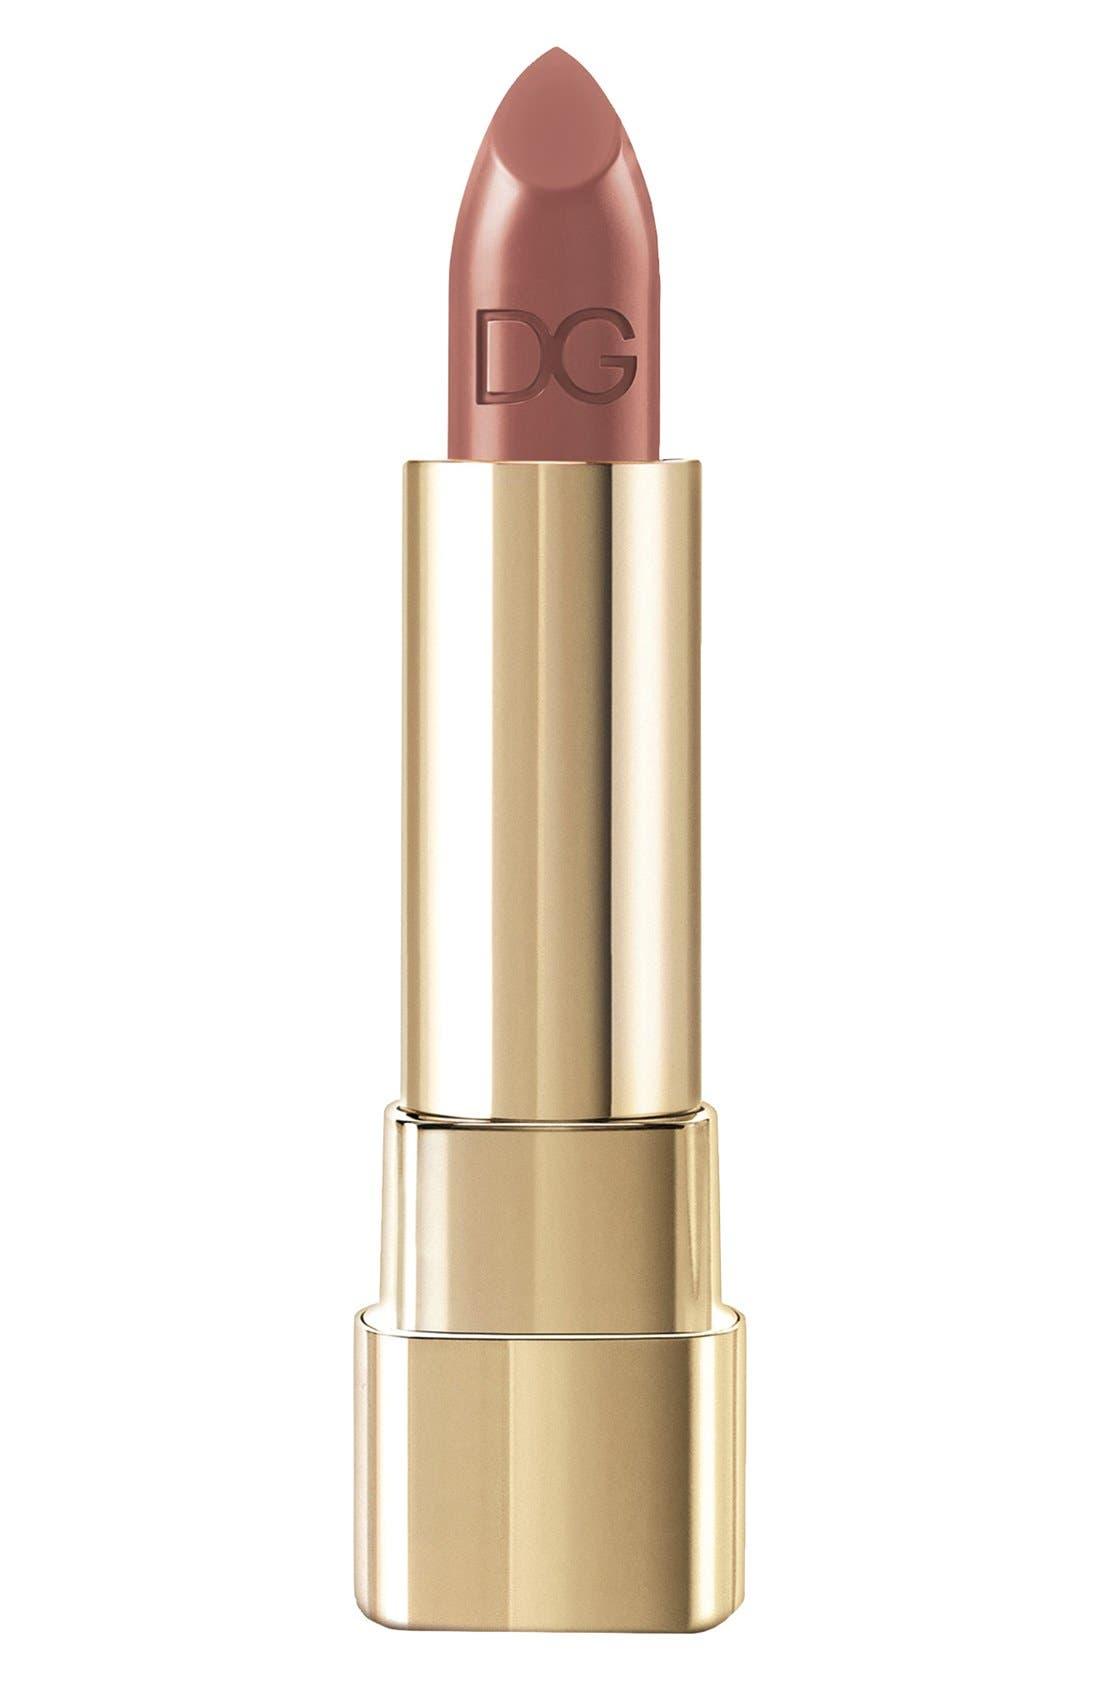 Dolce&Gabbana Beauty Classic Cream Lipstick